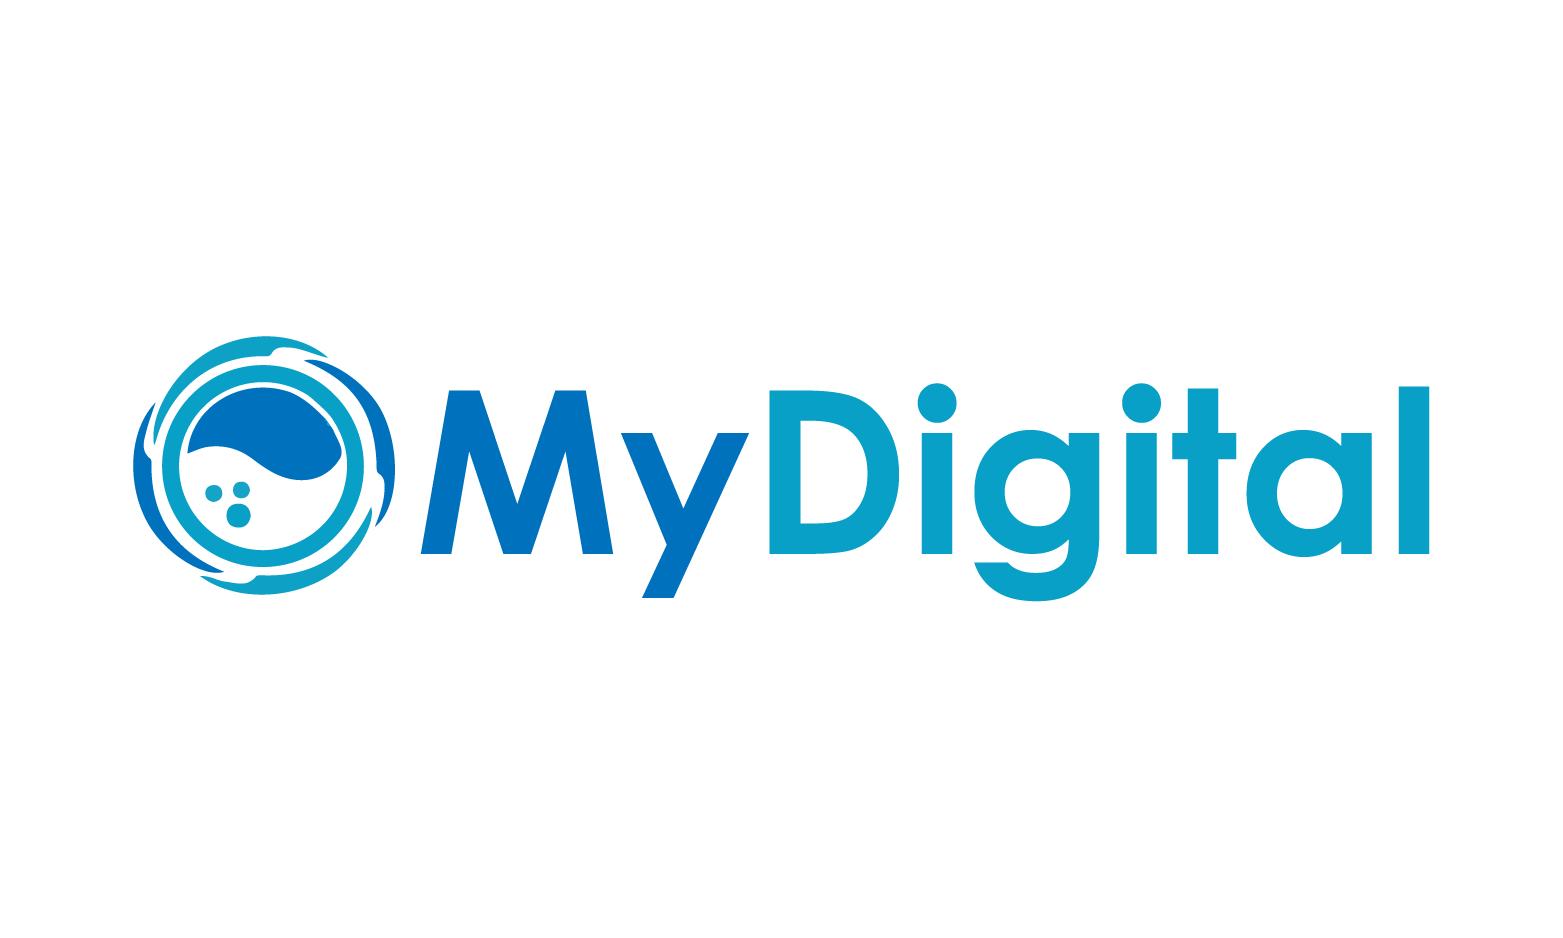 MyDigital.com